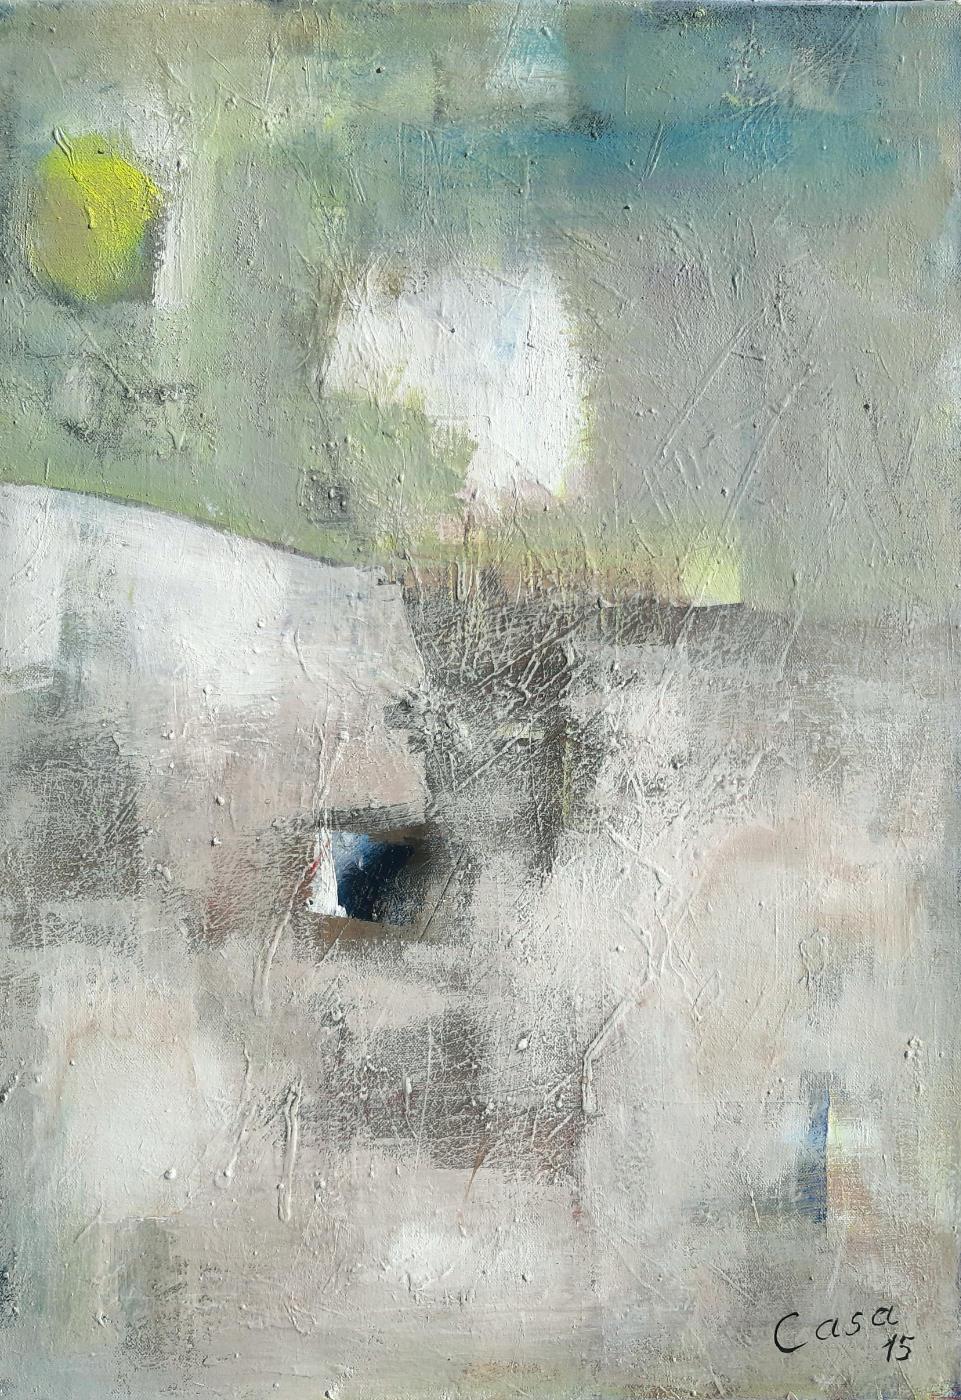 Refugium - Acryl auf Leinwand, 70 x 50 cm